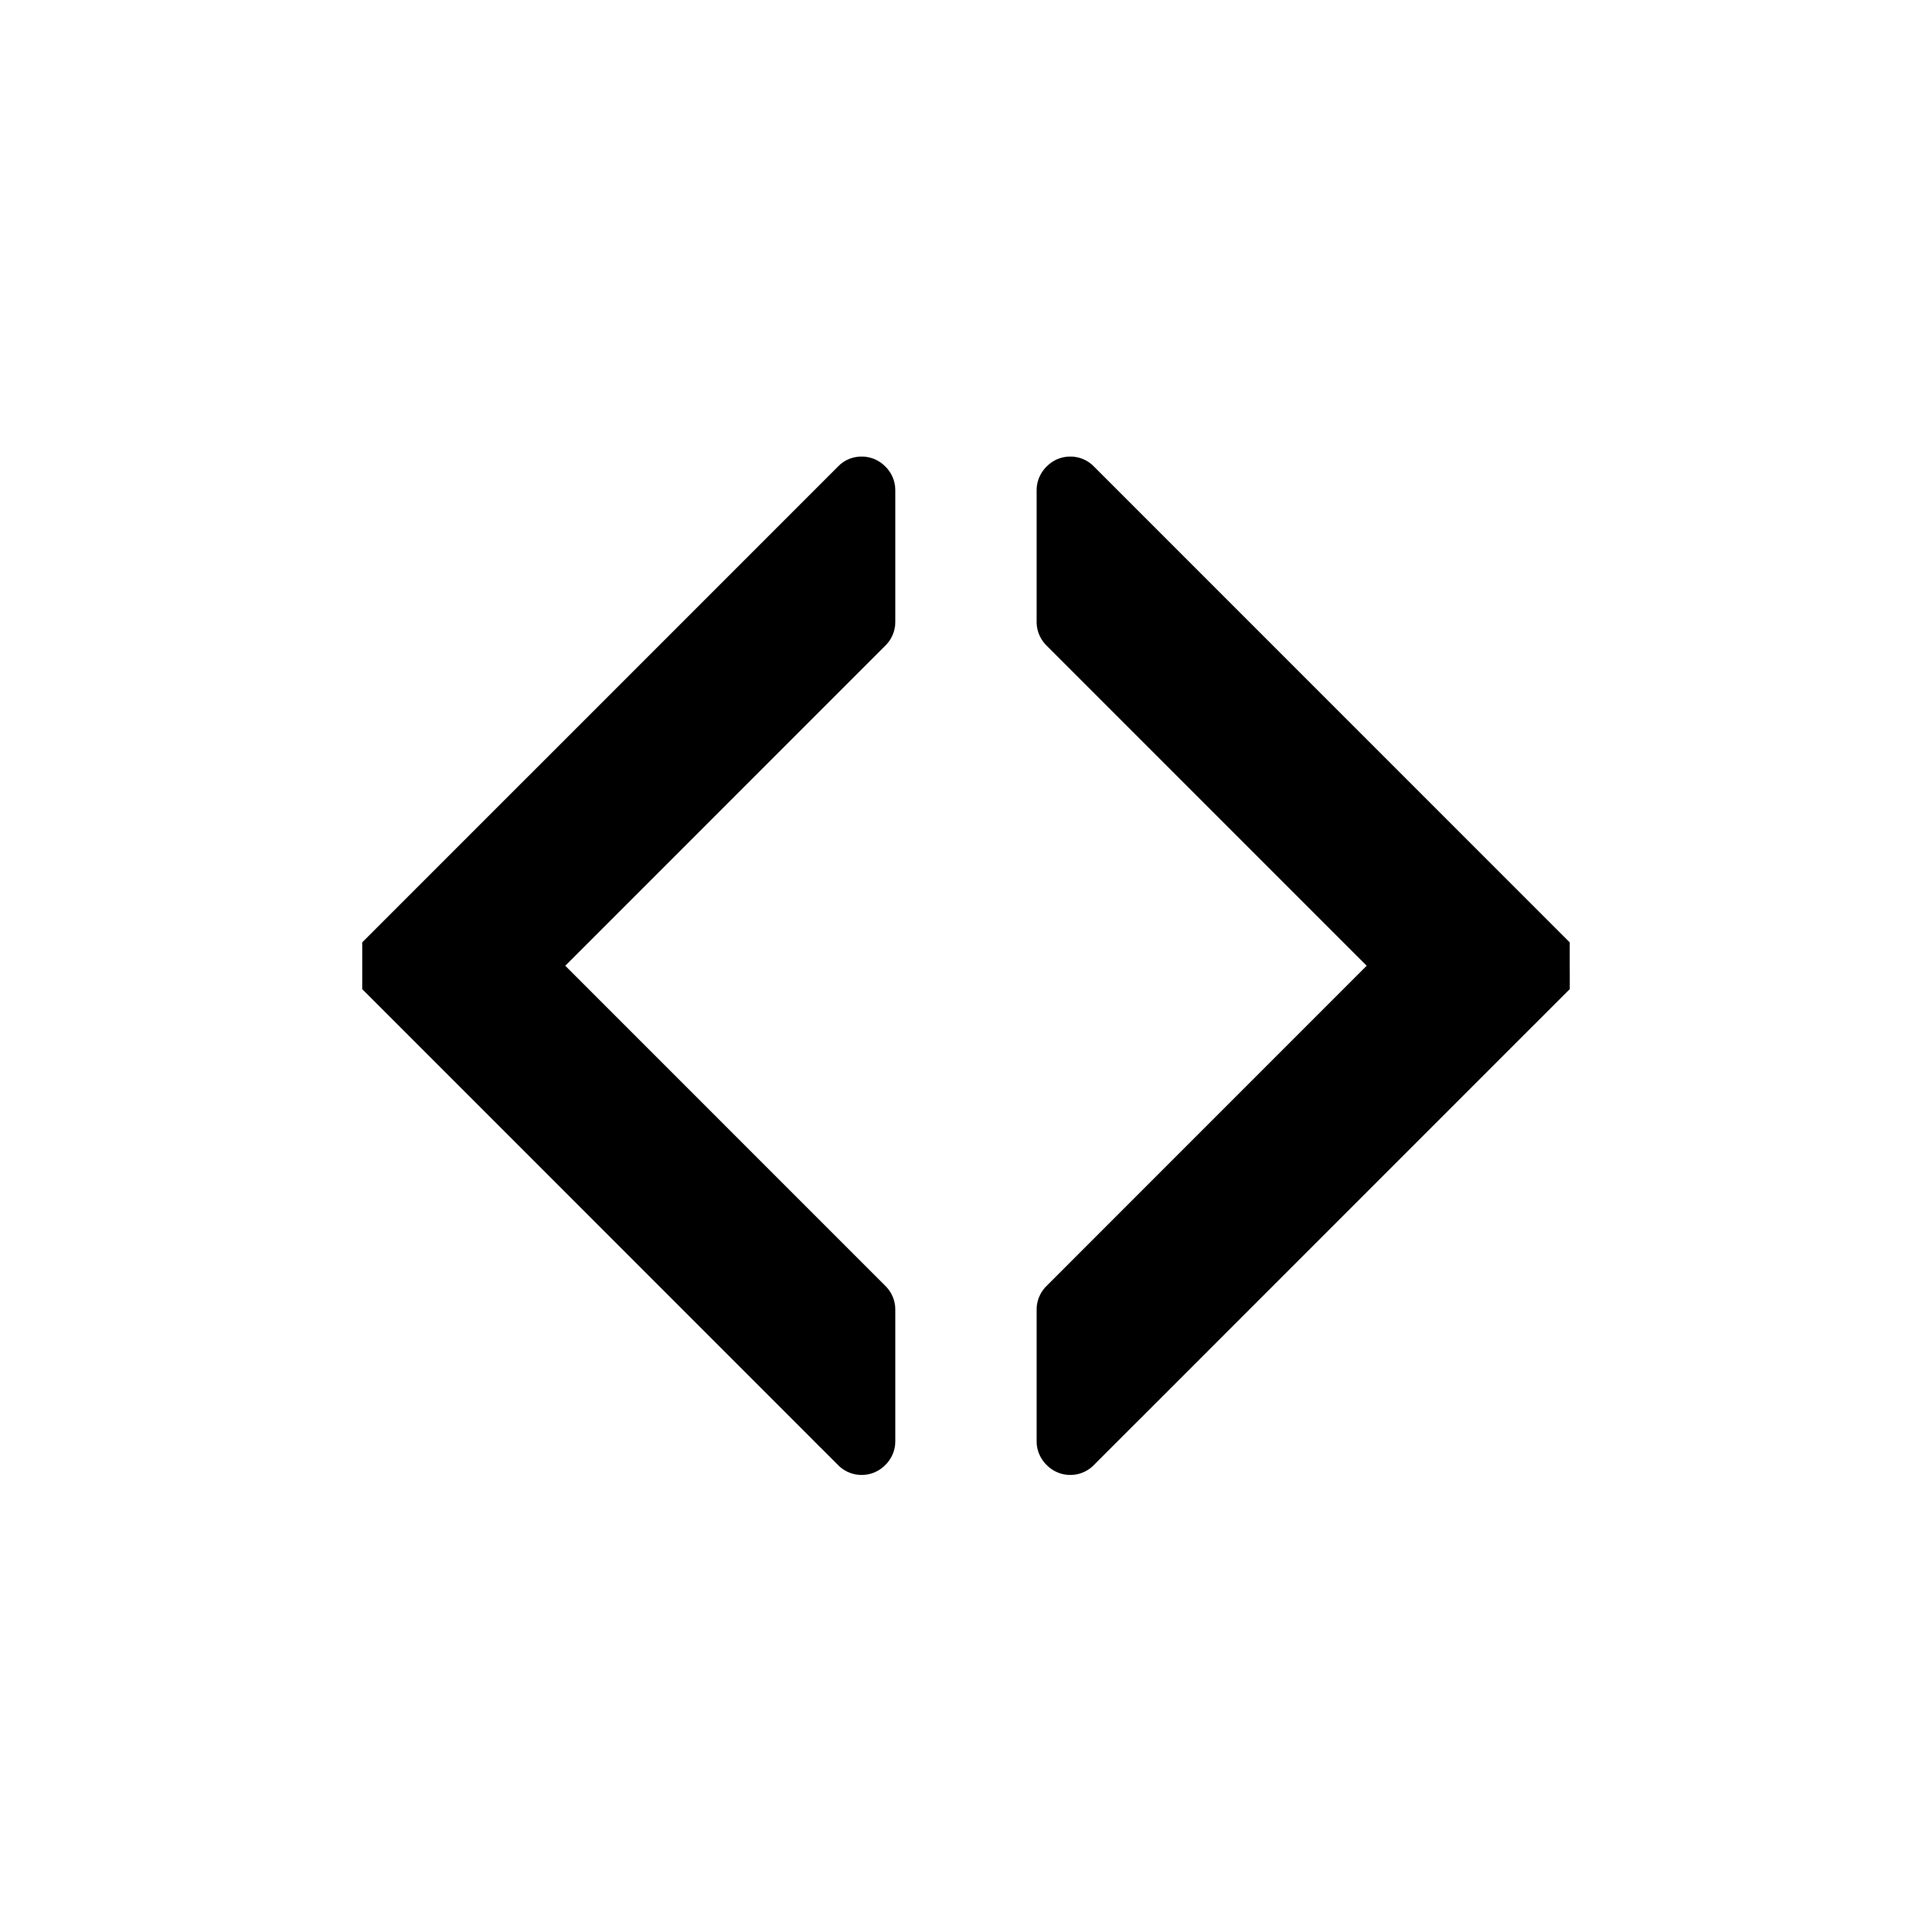 codeschool icon